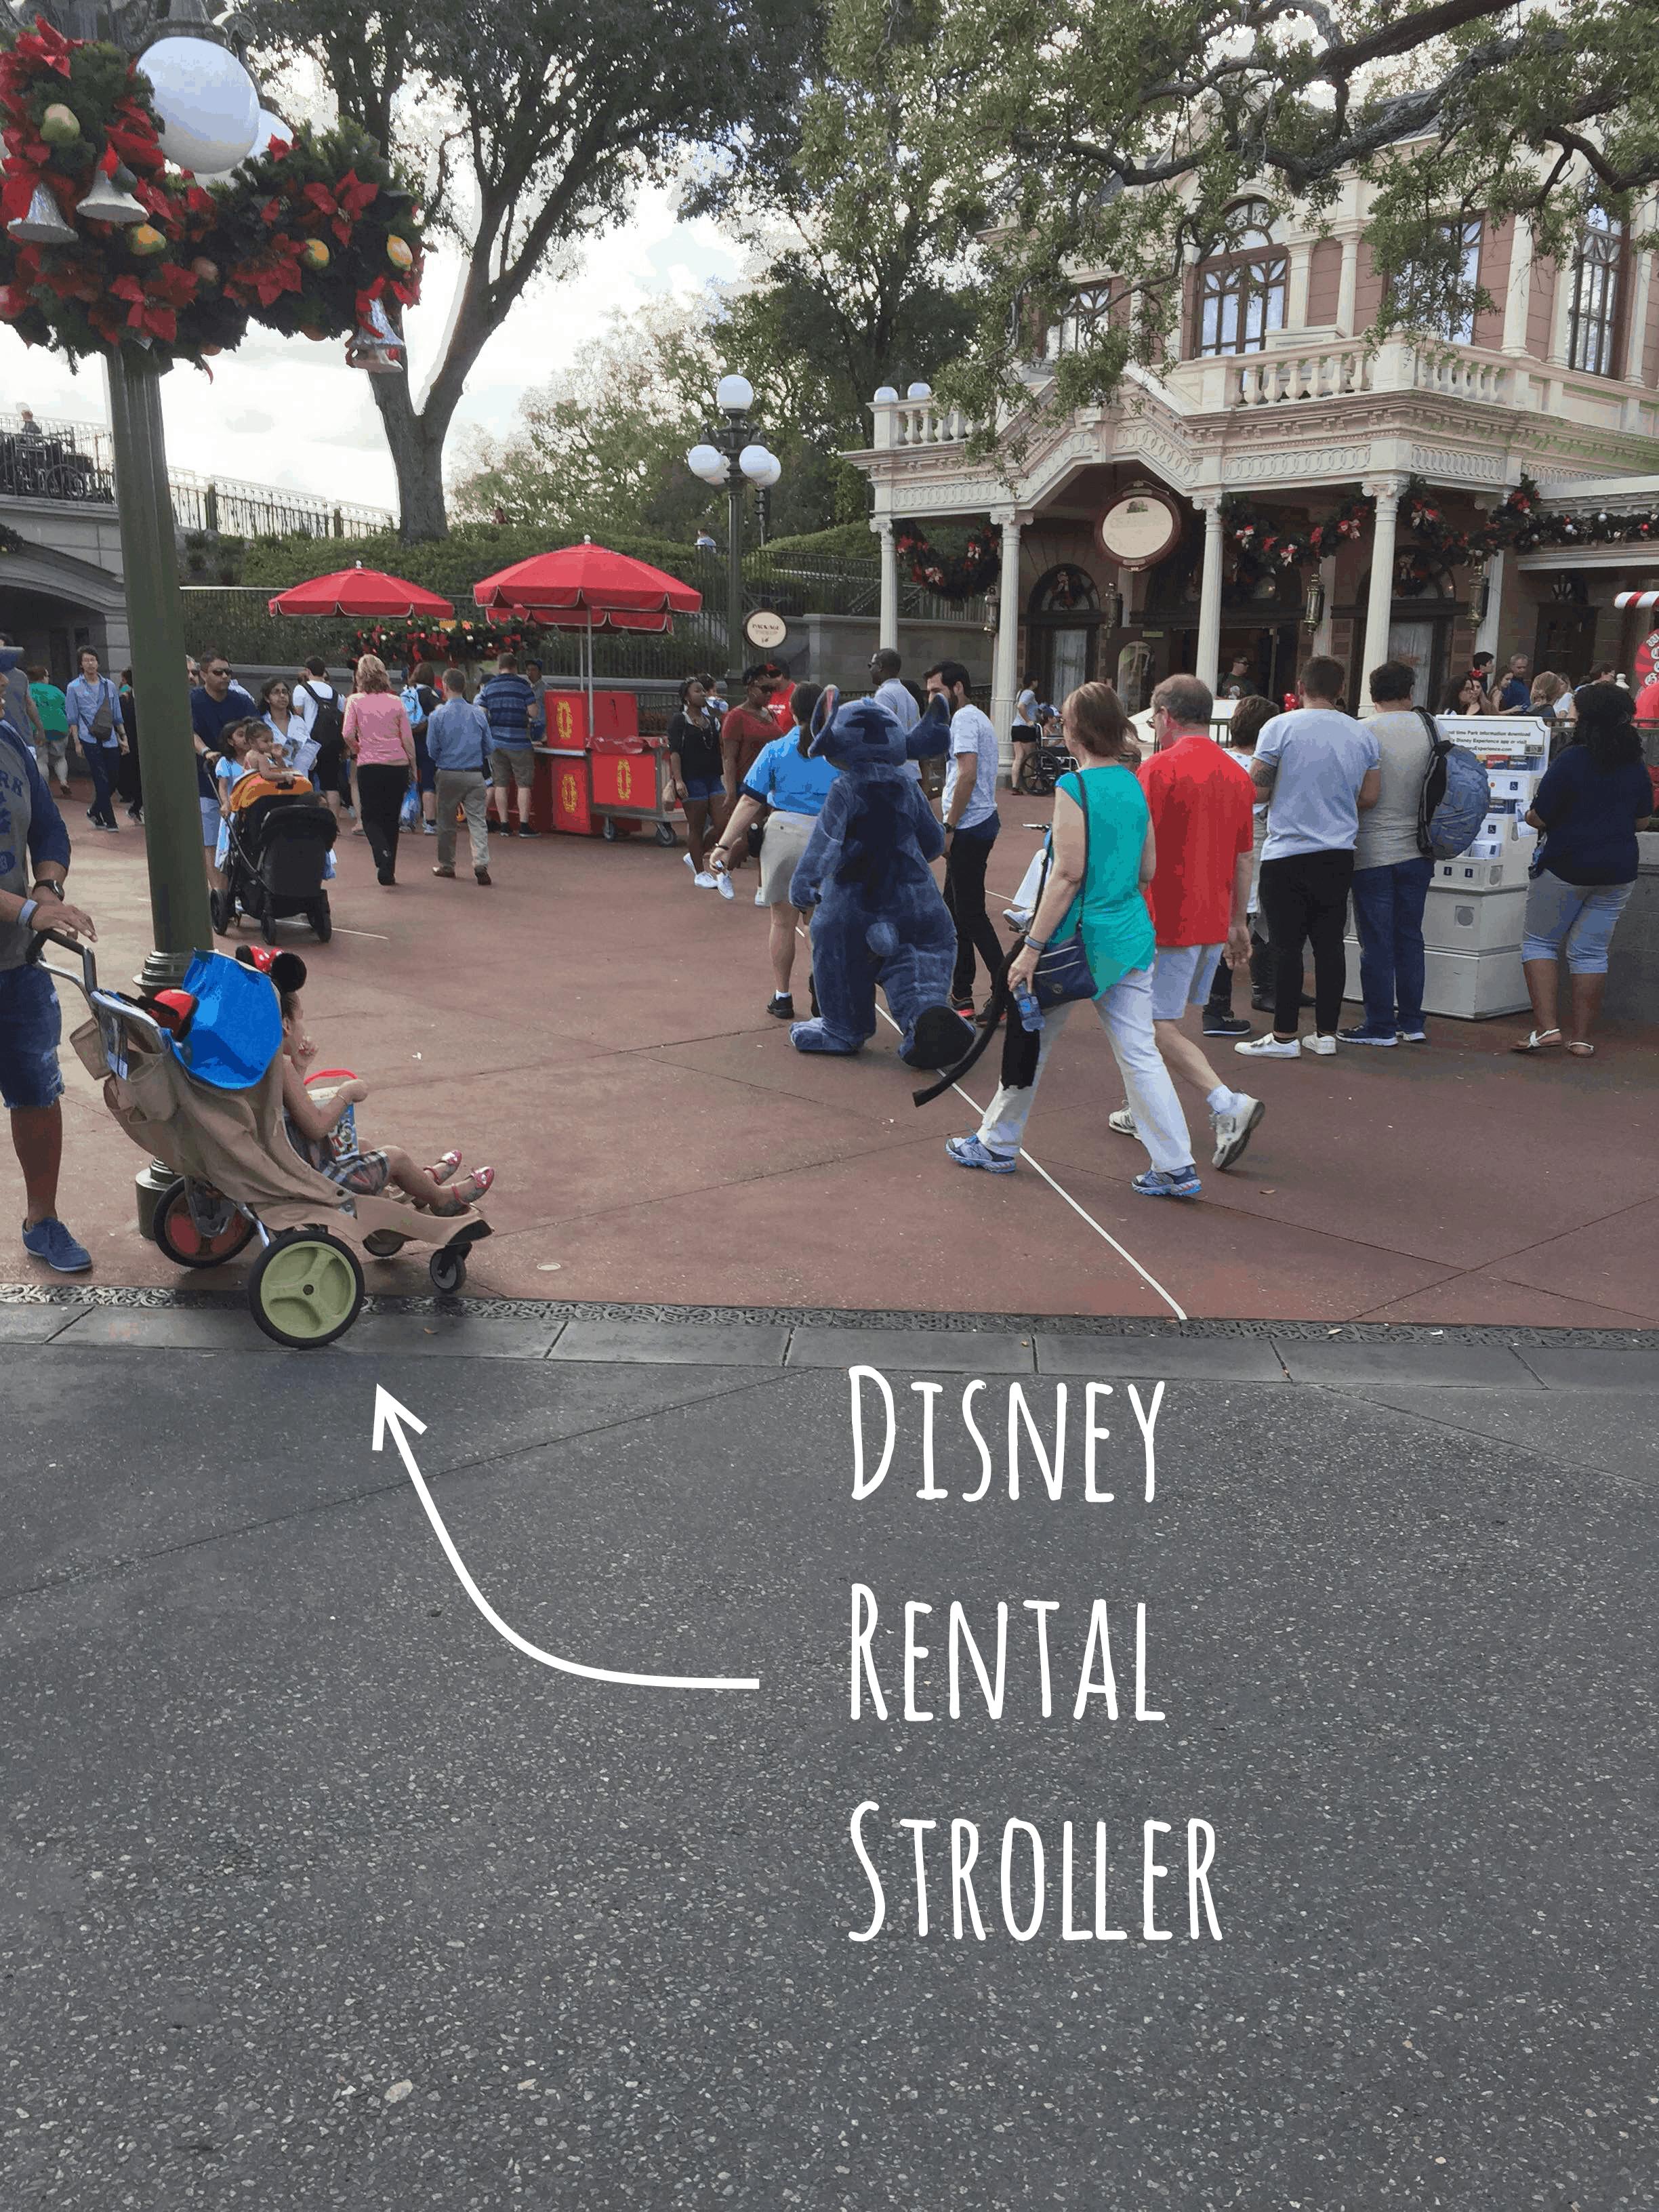 disney rental stroller in the park